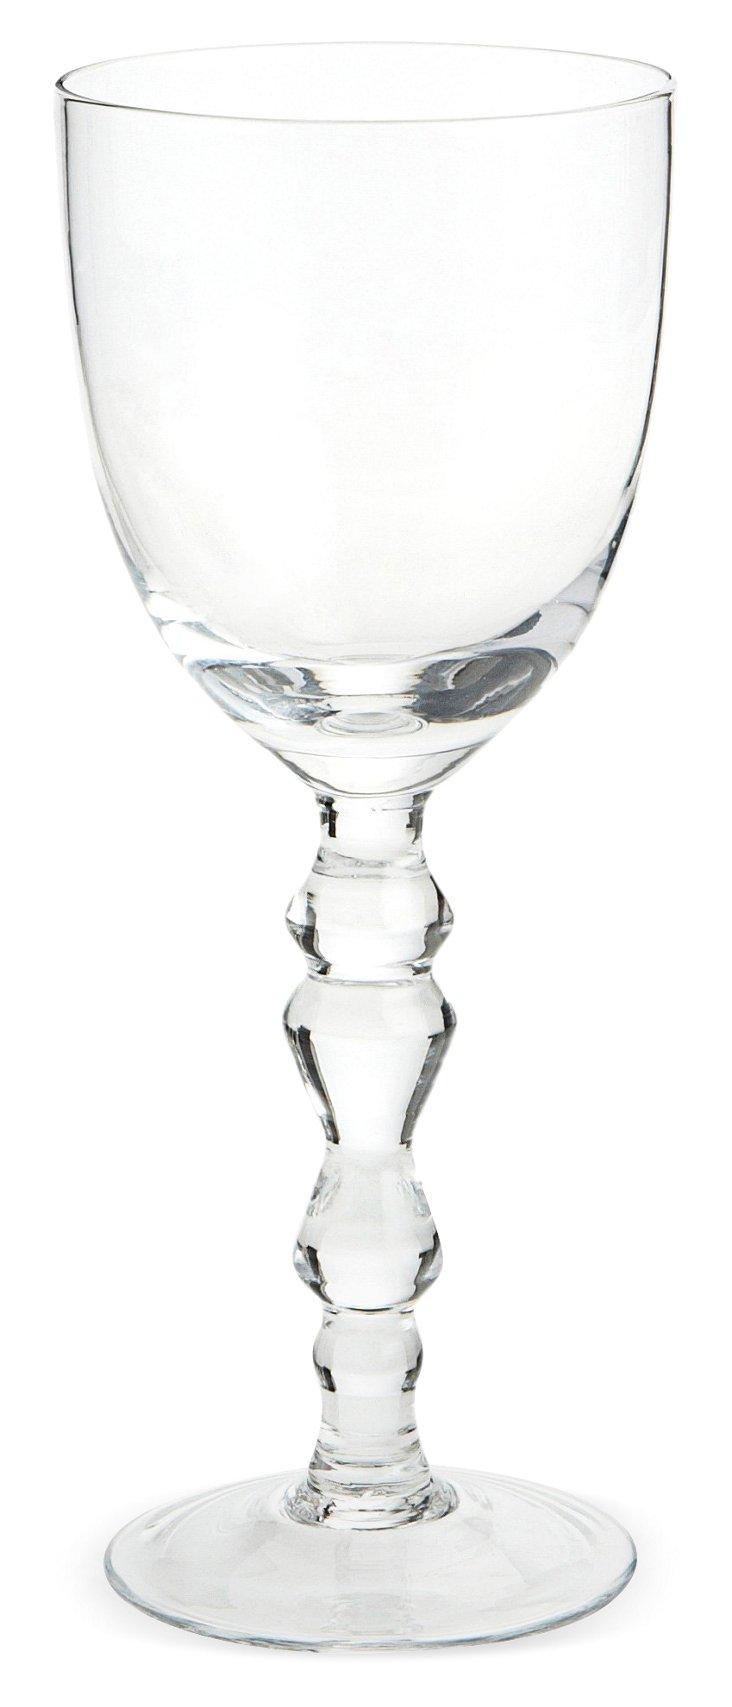 S/6 Vintage Style Goblets